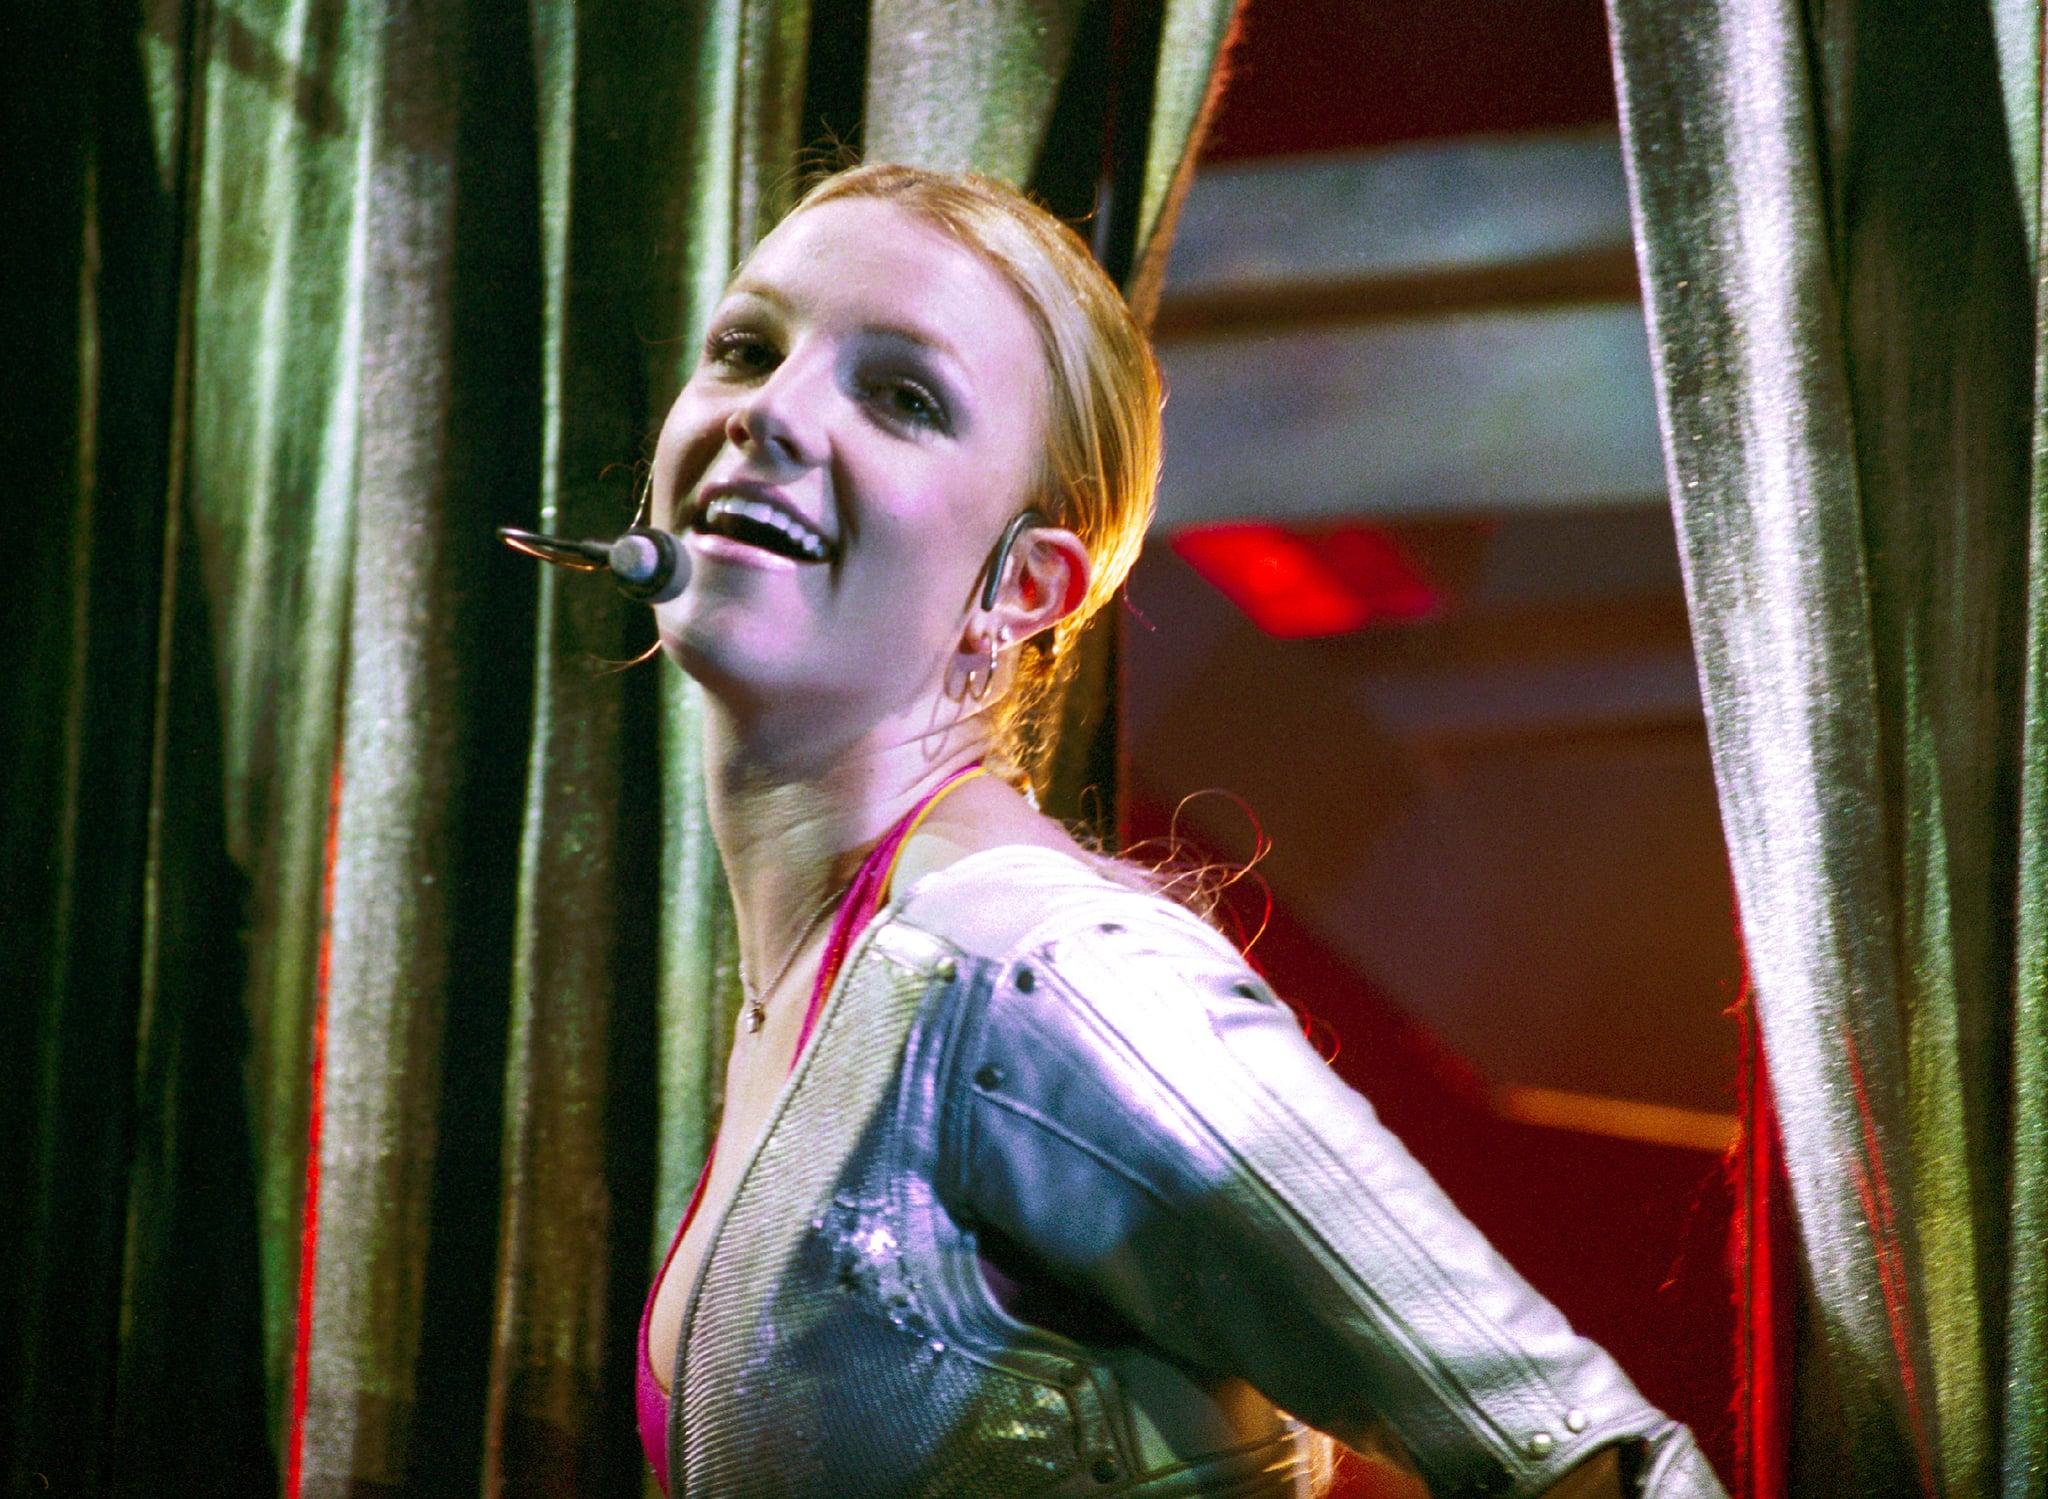 Britney Spears performs on stage at Gelredome, Arnhem, Netherlands, 4th November 2000. (Photo by Rob Verhorst/Redferns)